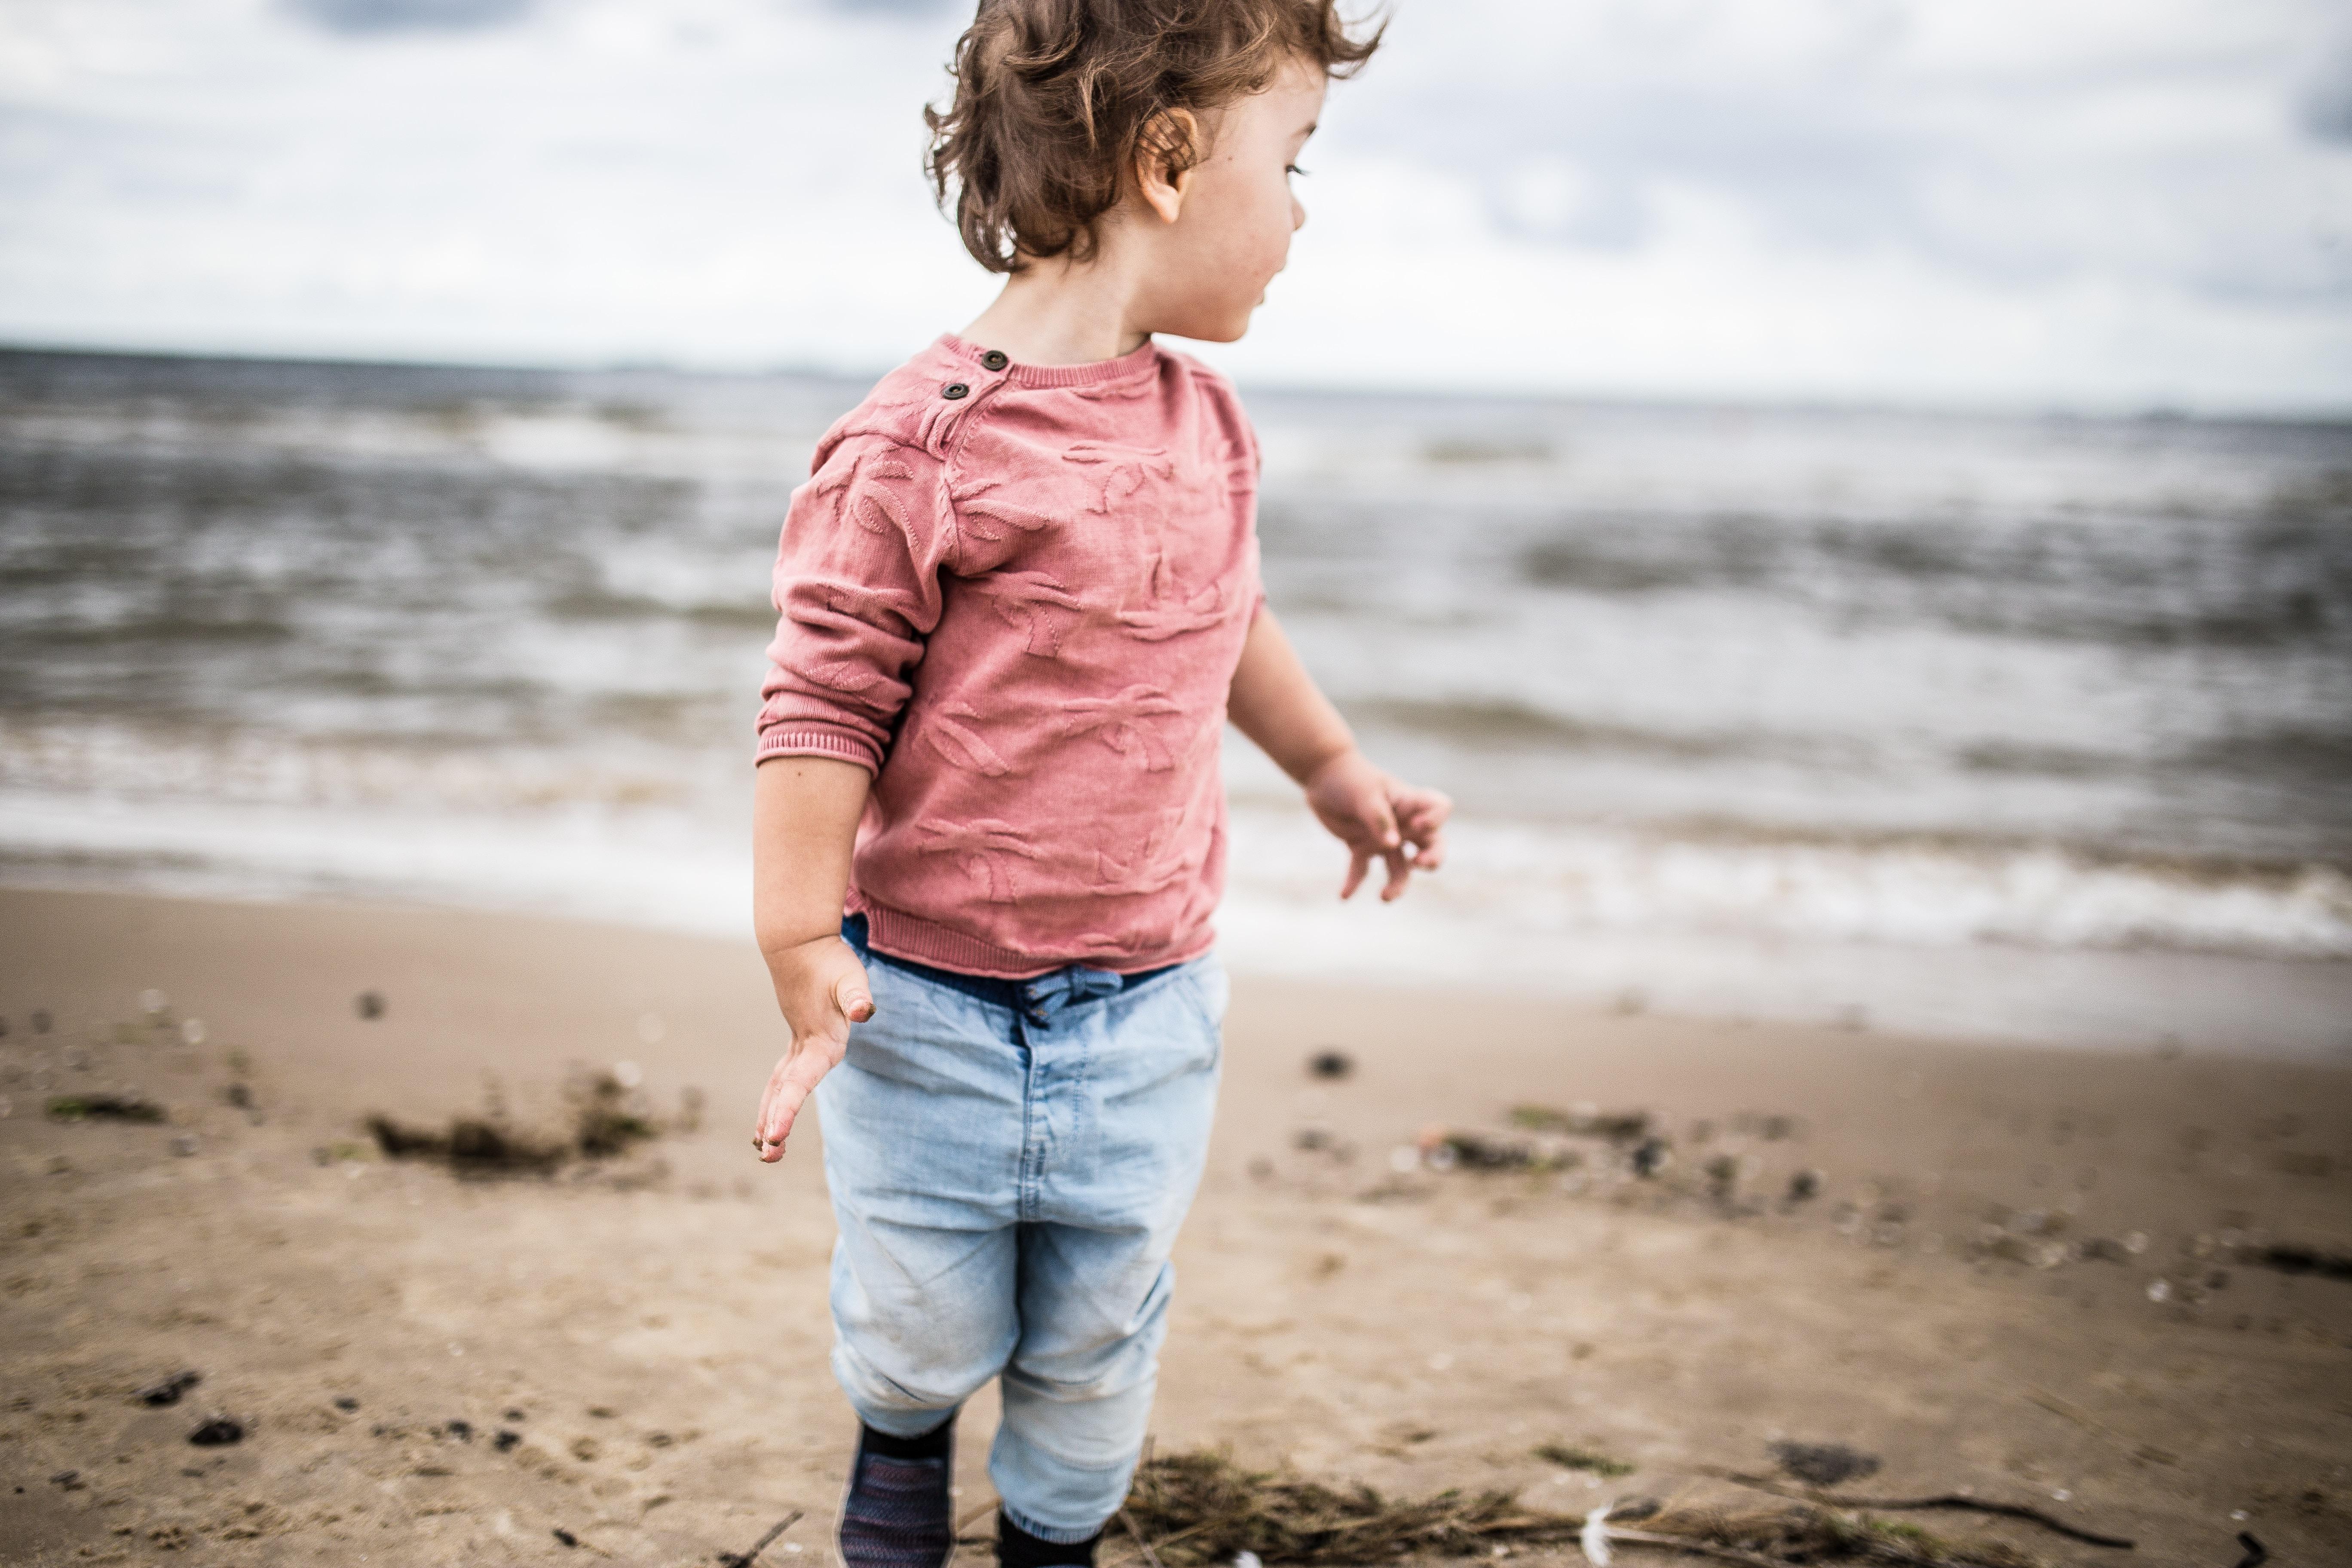 Small child playing on the sand beach at Radisson Blu Resort Świnoujście